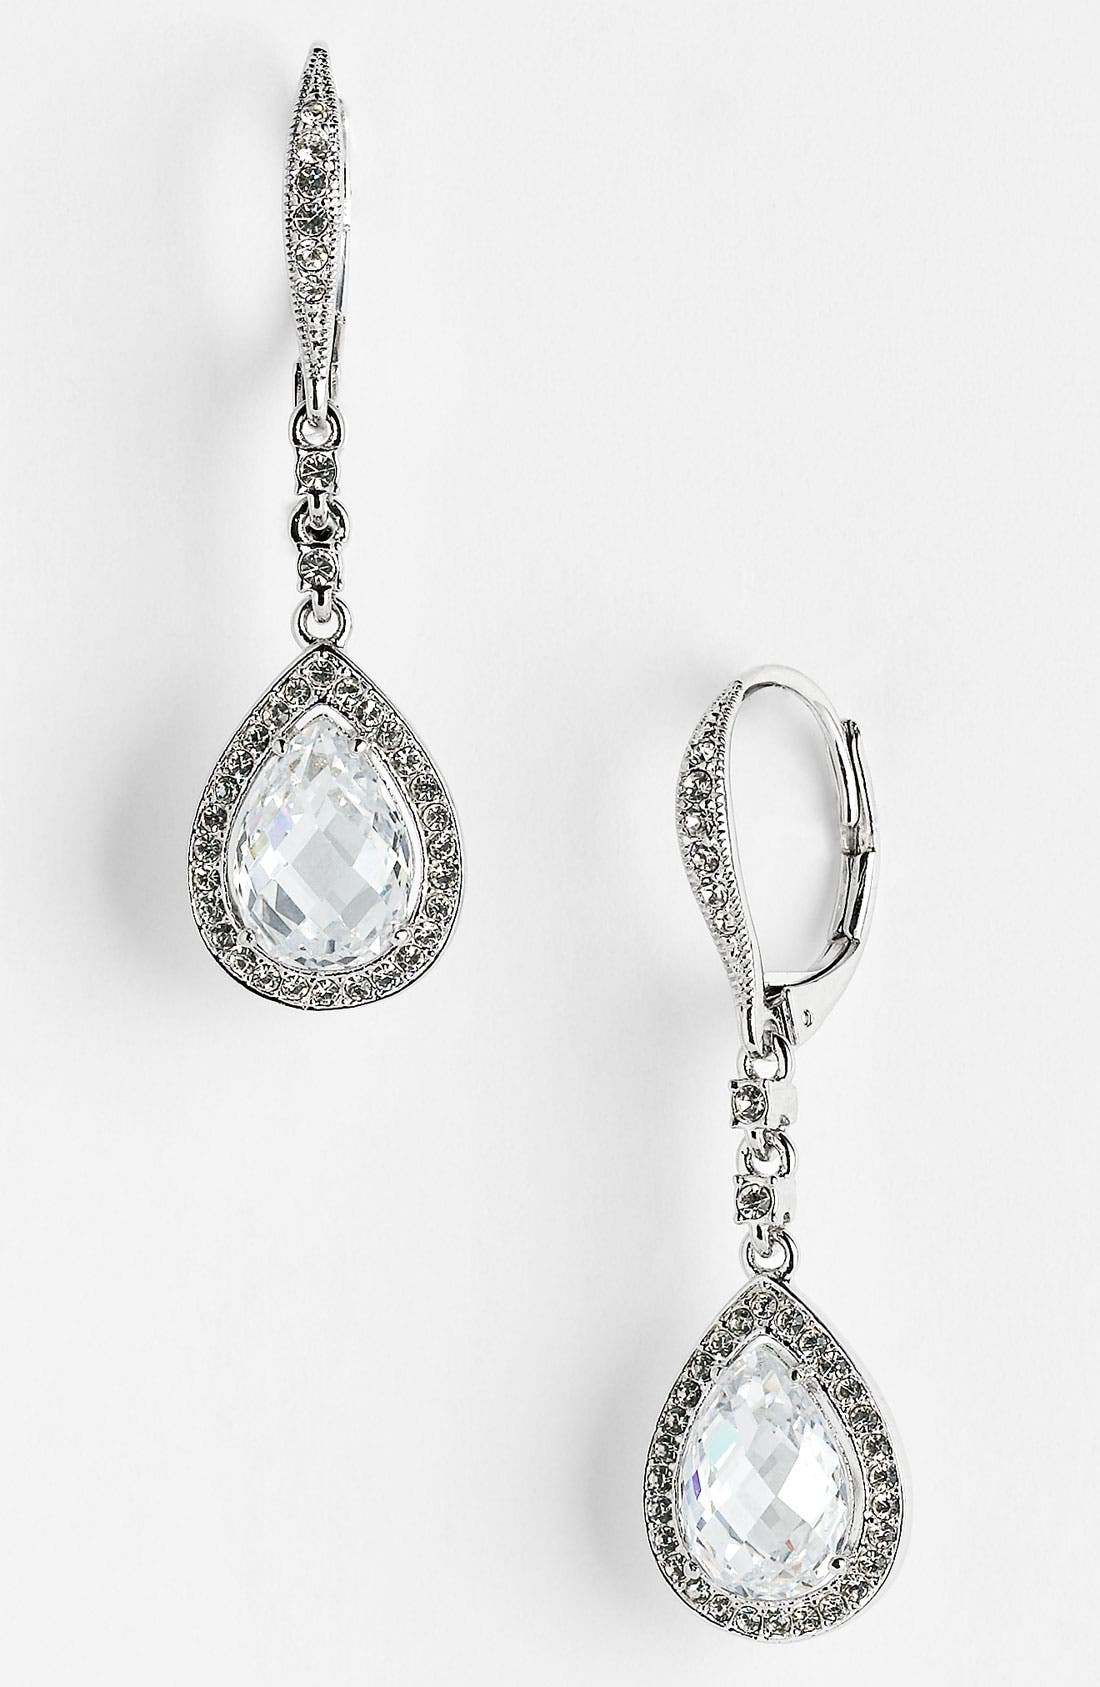 Main Image - Nadri Cubic Zirconia Pear Drop Earrings (Nordstrom Exclusive)